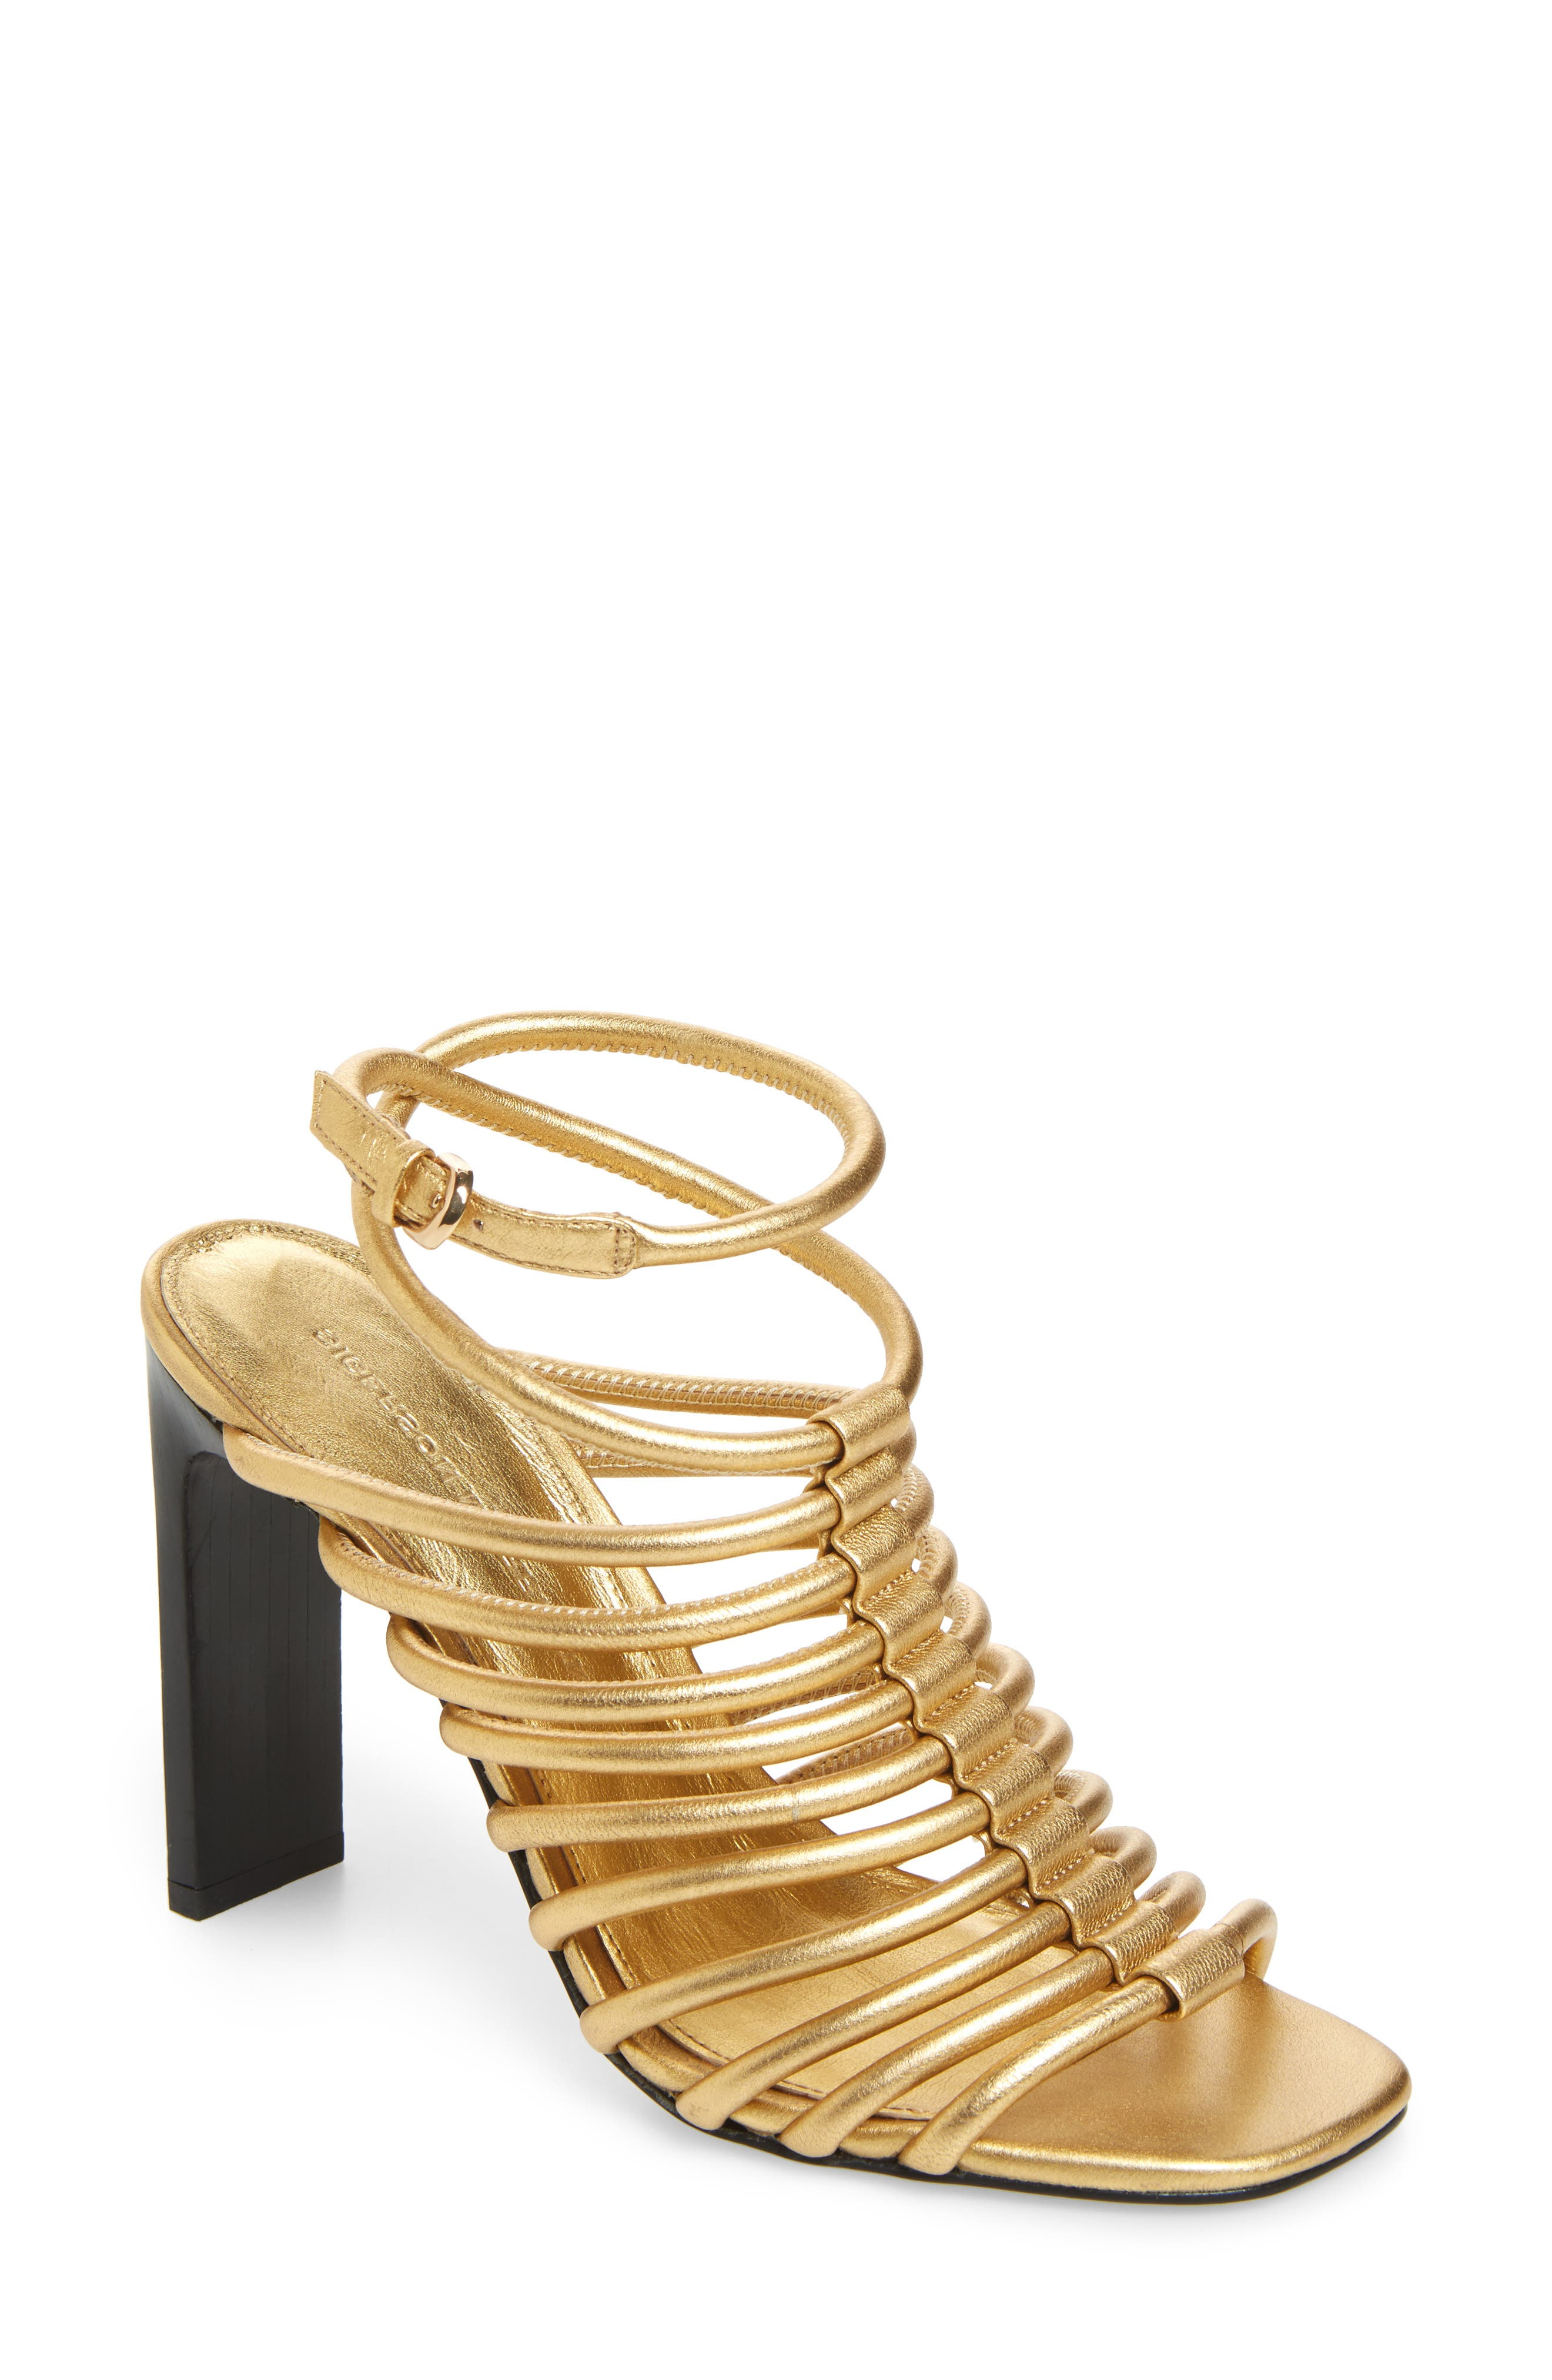 HH Caged Ankle Strap Sandal,                         Main,                         color, 710